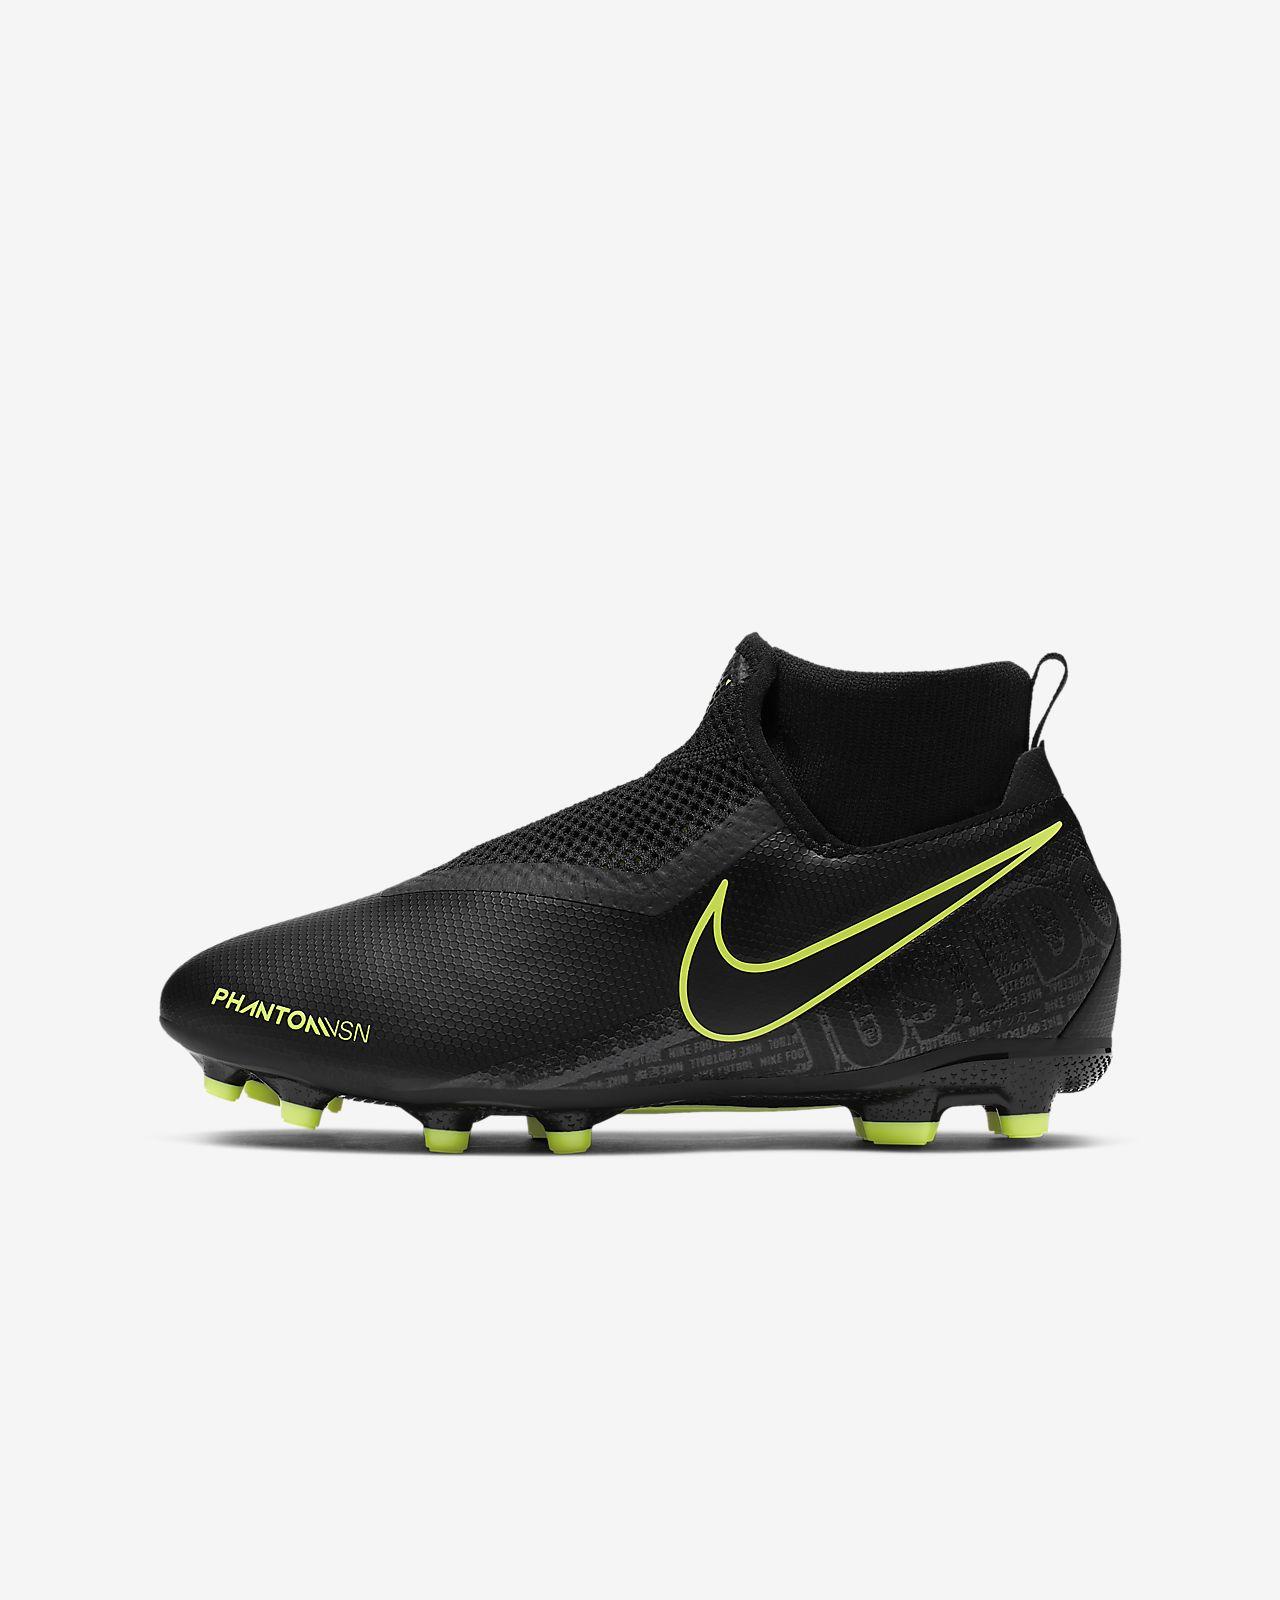 dbe5a17b5 ... Nike Jr. Phantom Vision Academy Dynamic Fit MG Little/Big Kids' Multi-